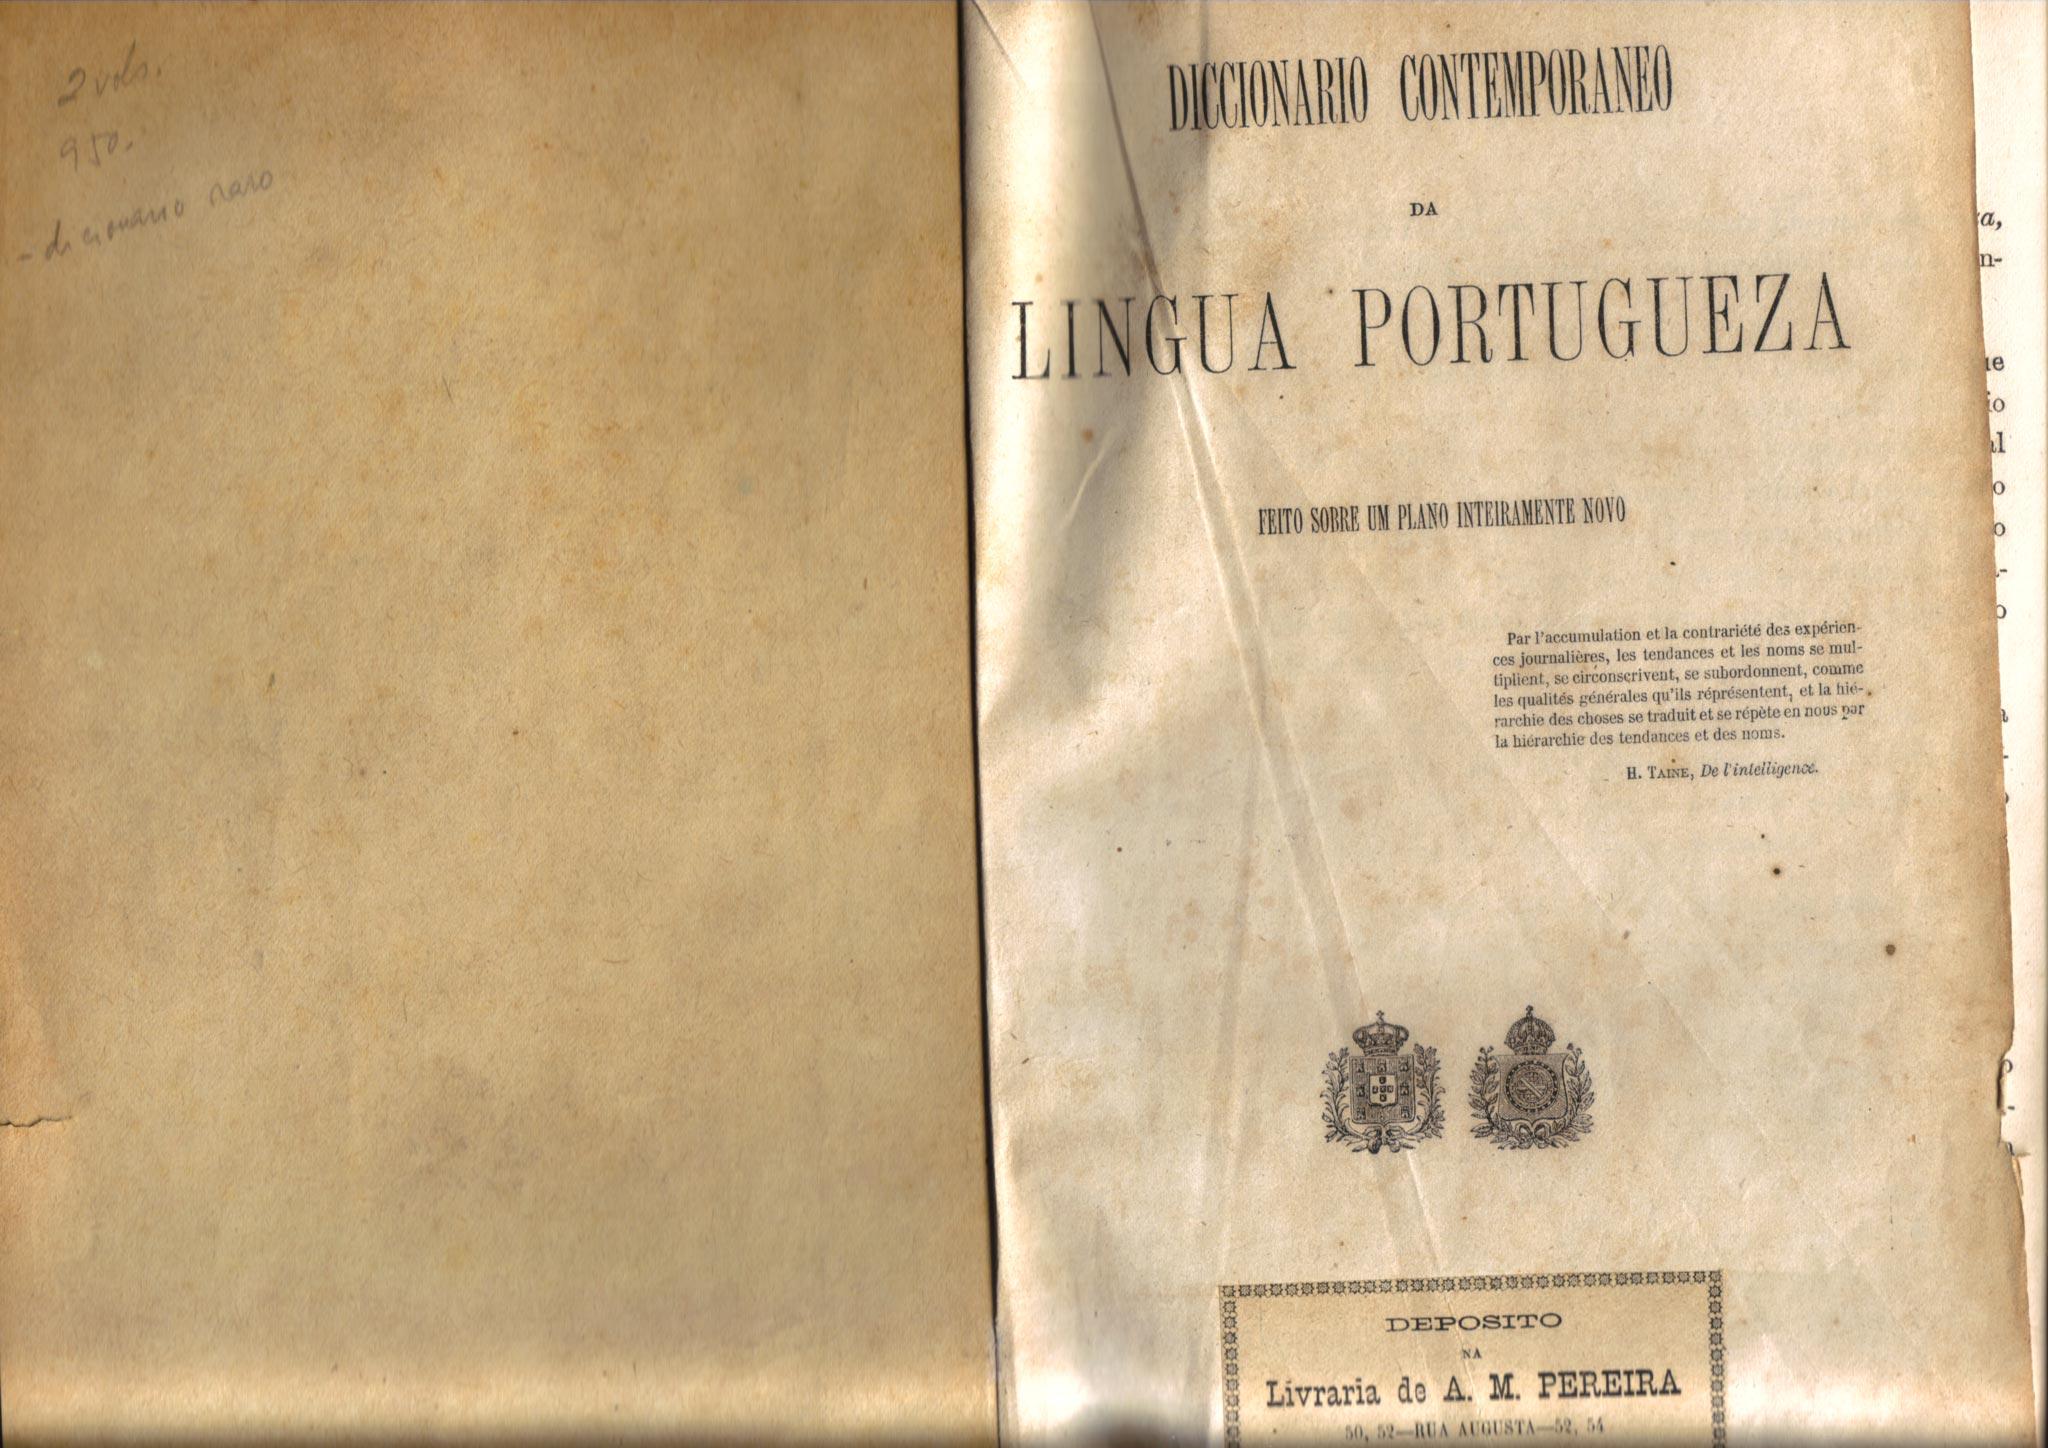 Diccionaro Contemporaneo da Língua Portugueza, Imprensa Nacional, Lisboa, 1881.